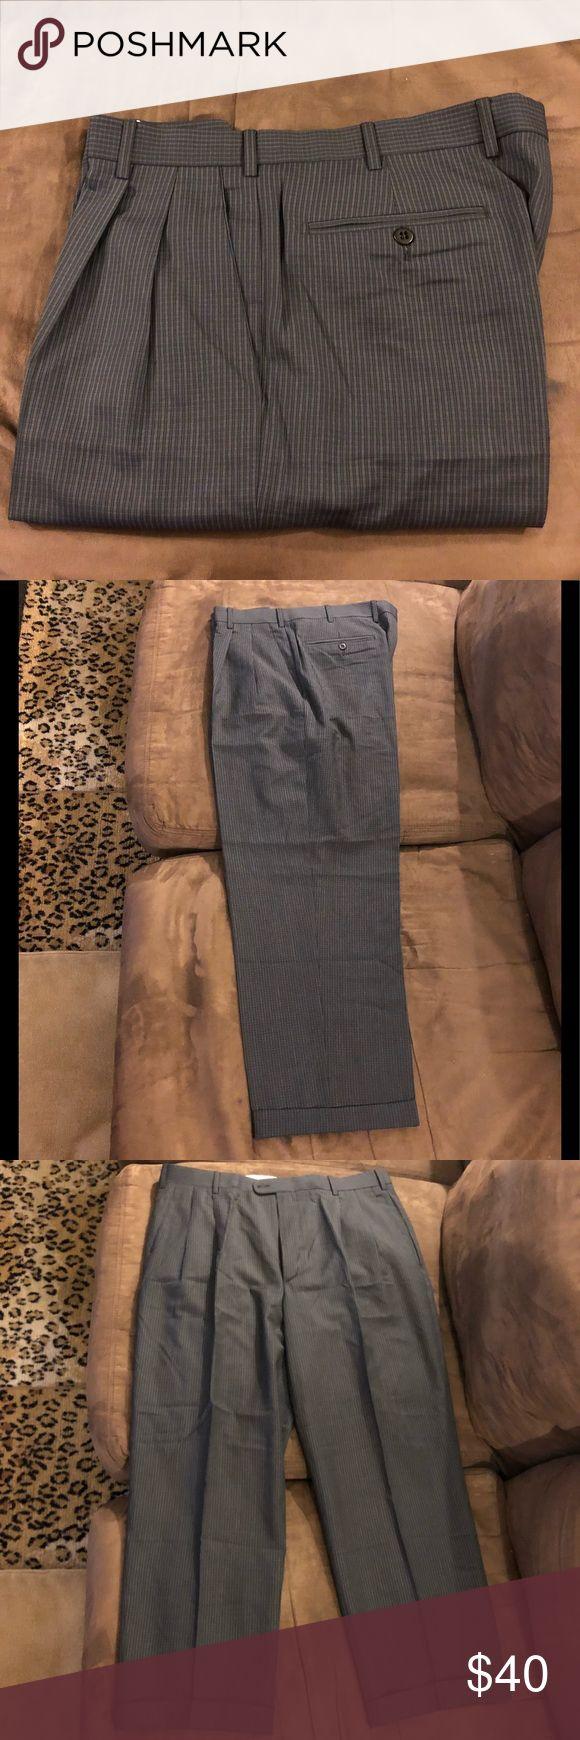 Zanella Navy & Grey Check Plaid Dress Pants 36 Zanella Navy Blue and Grey Check Plaid Dress Pants size 36x28, Pleated and cuffed! Like new!  Please make reasonable offers and bundle! Ask questions :) Zanella Pants Dress